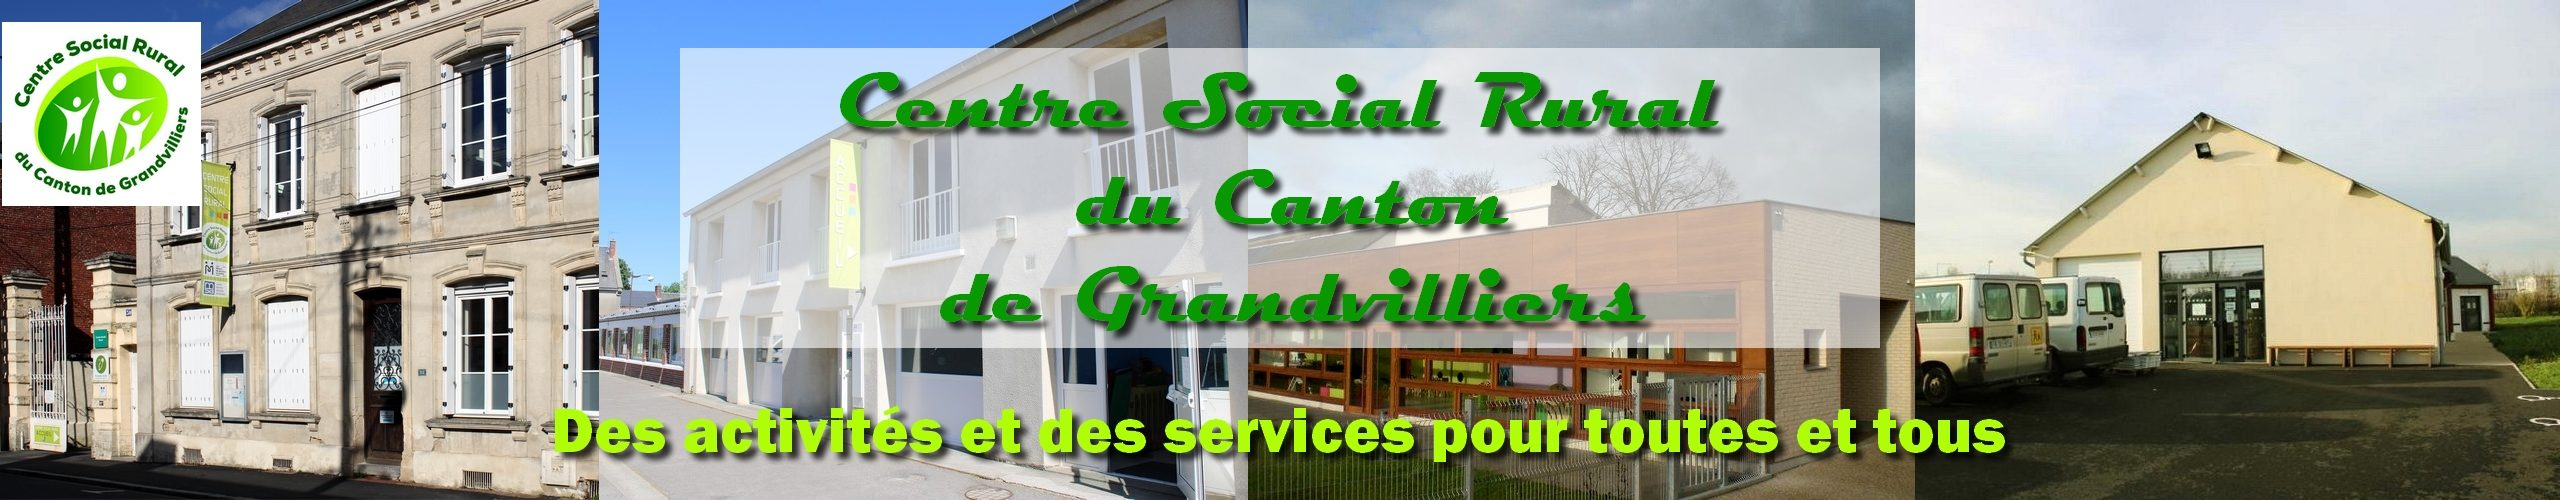 Centre social rural du canton de Grandvilliers